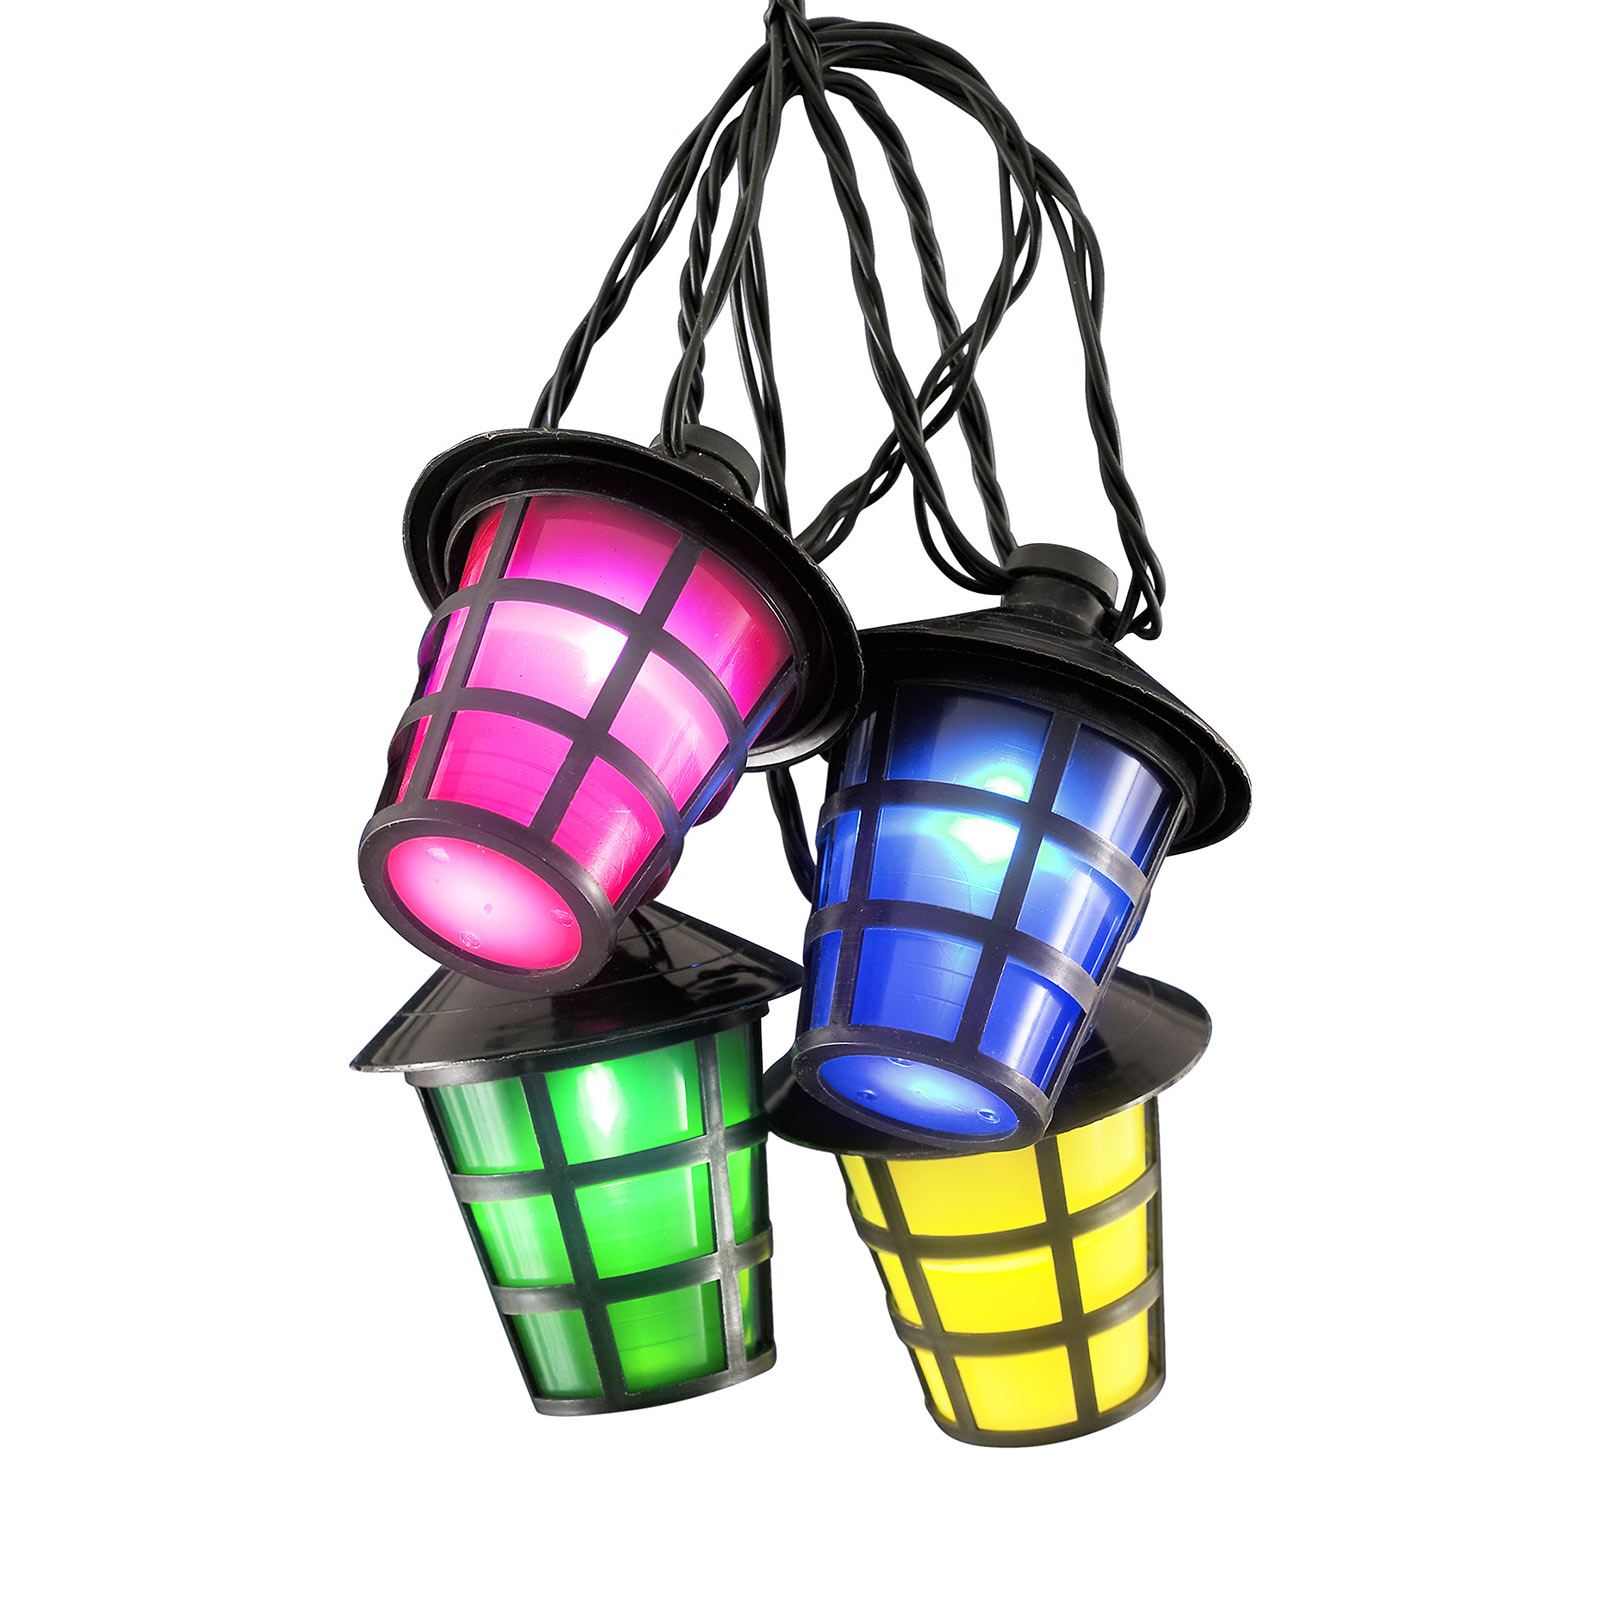 Catena luminosa Lampion, 20 lanterne LED colorate